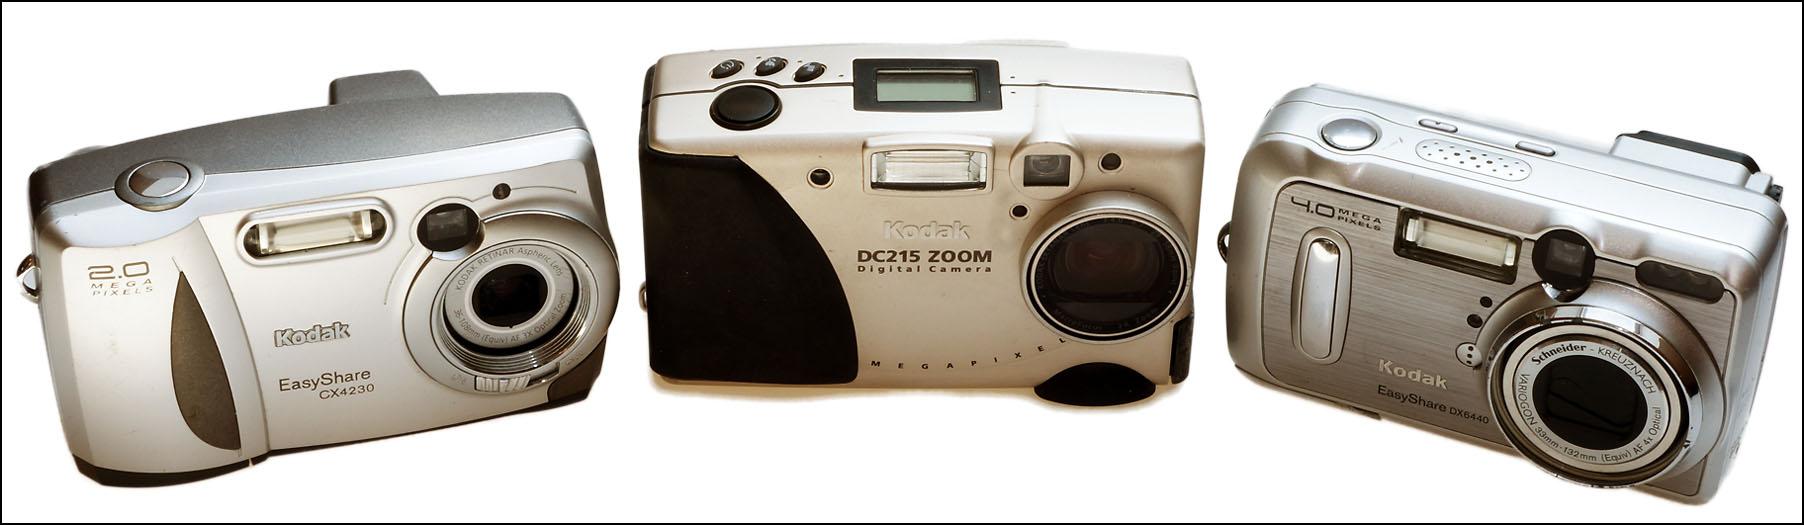 Groß Kodak Easy Digitale Rahmen Galerie - Benutzerdefinierte ...